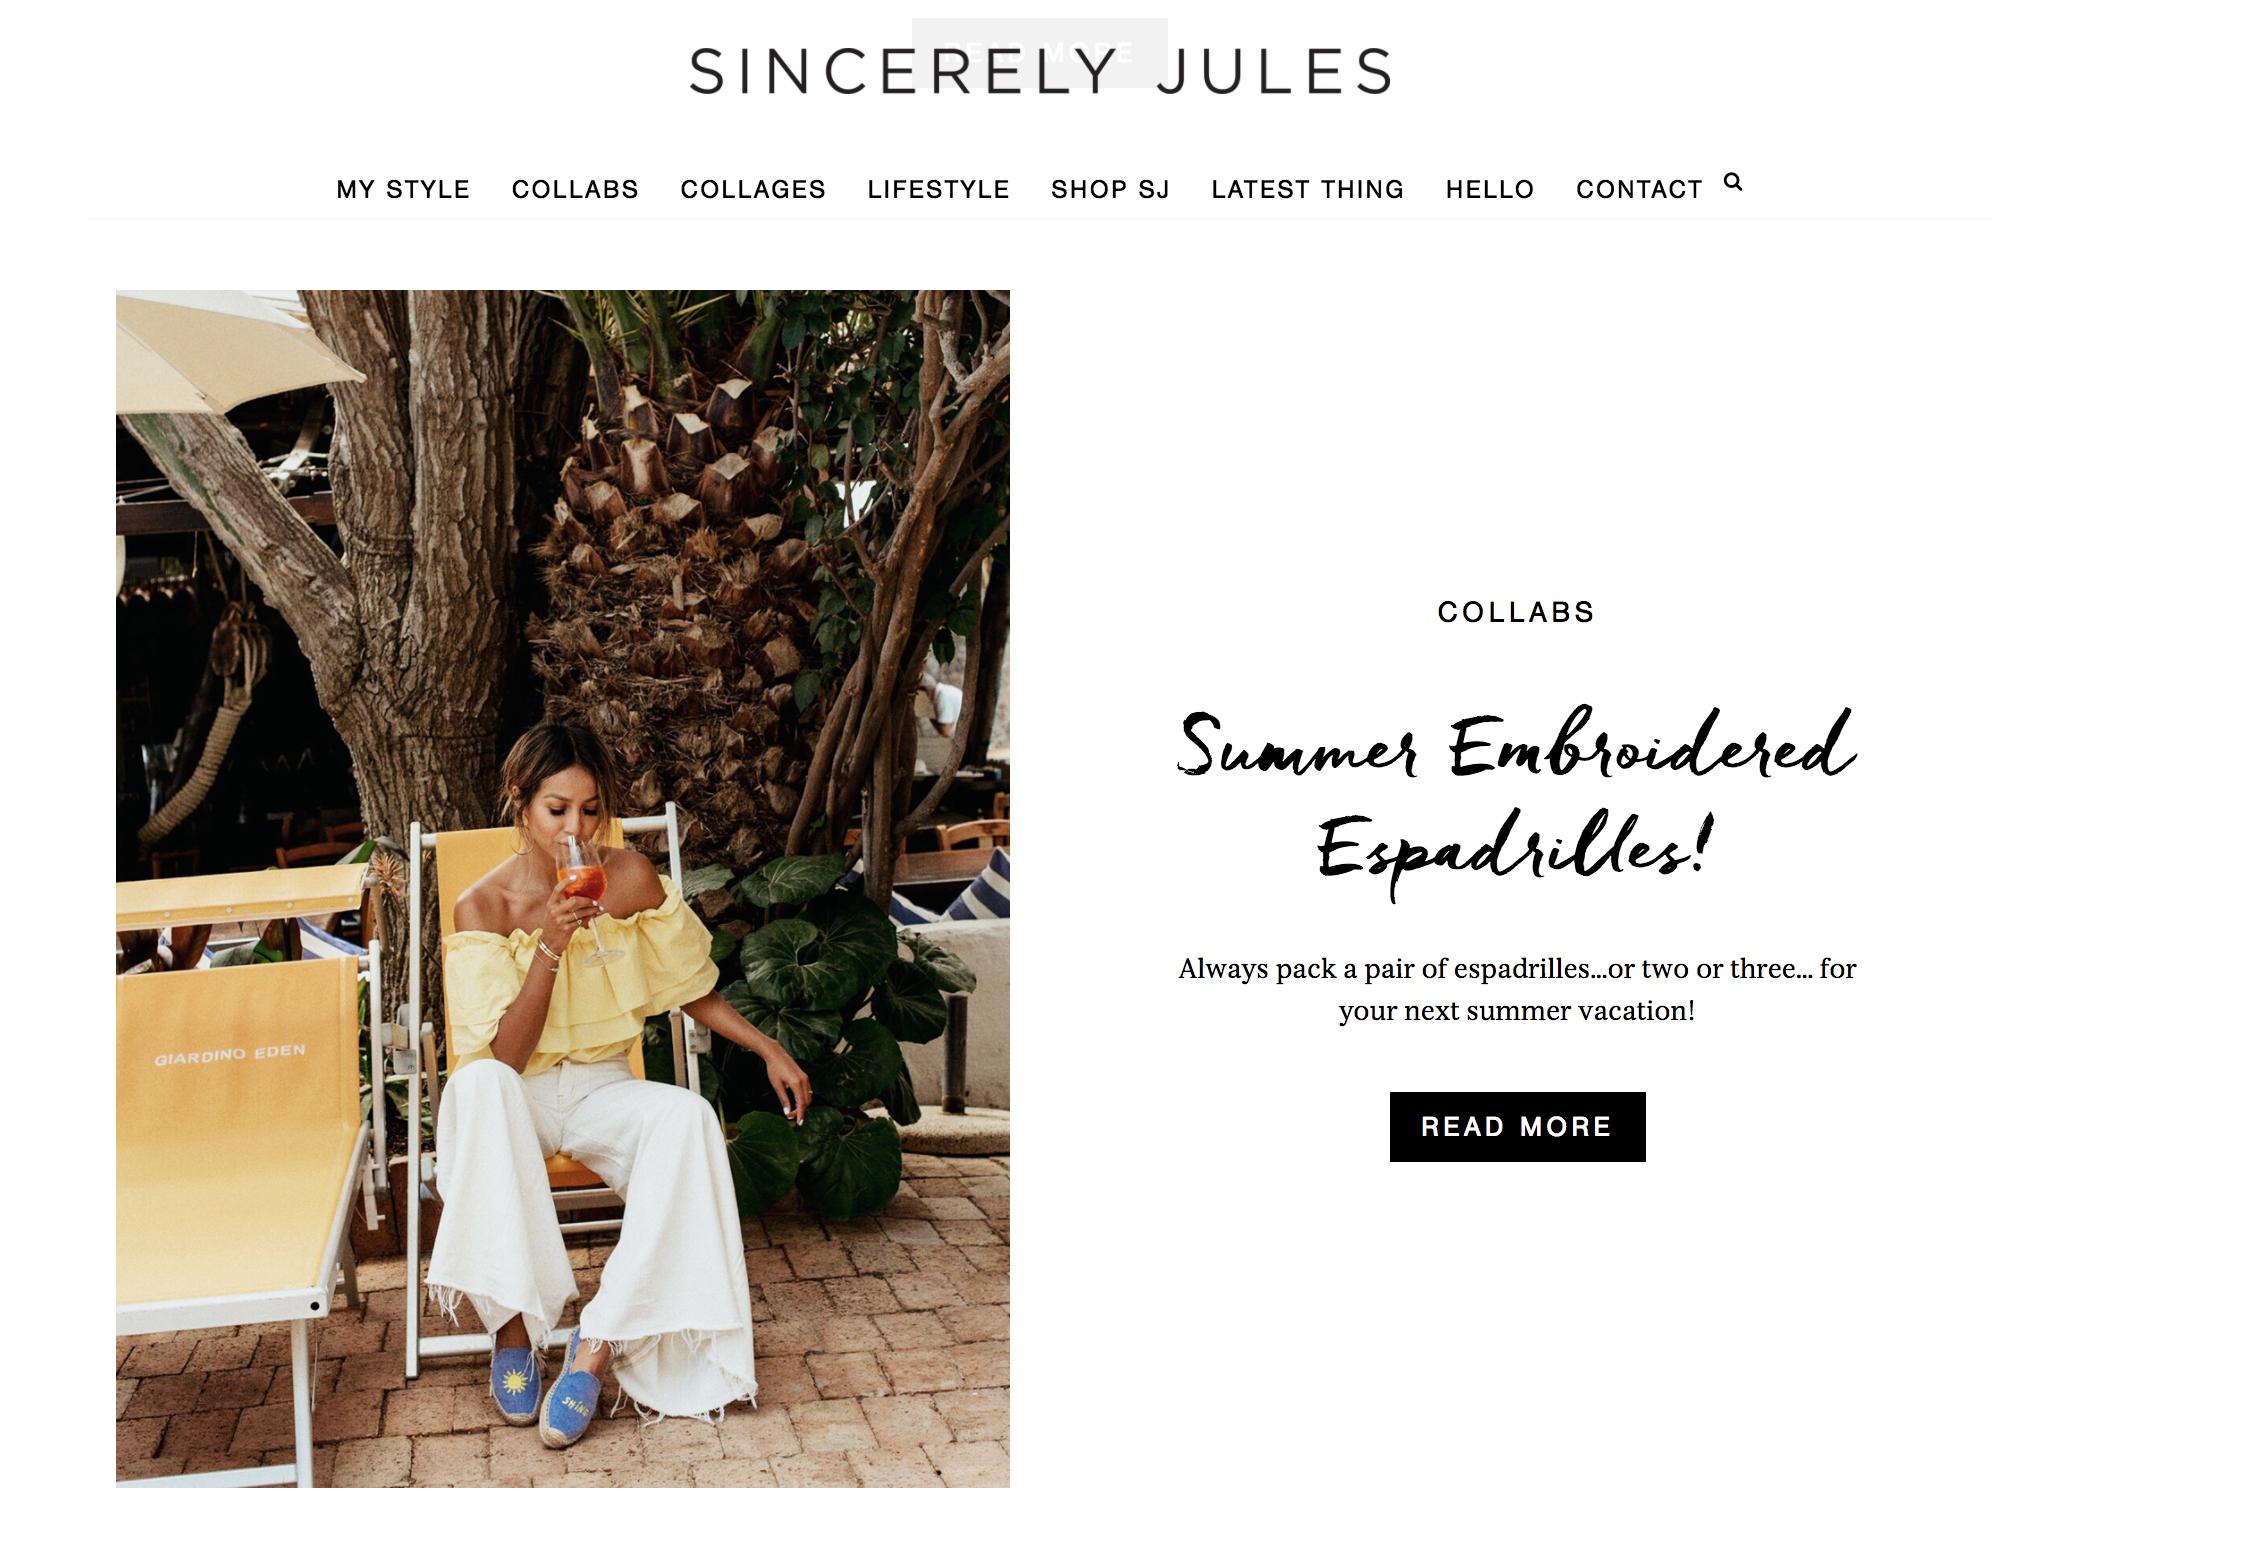 www.sincerelyjules.com